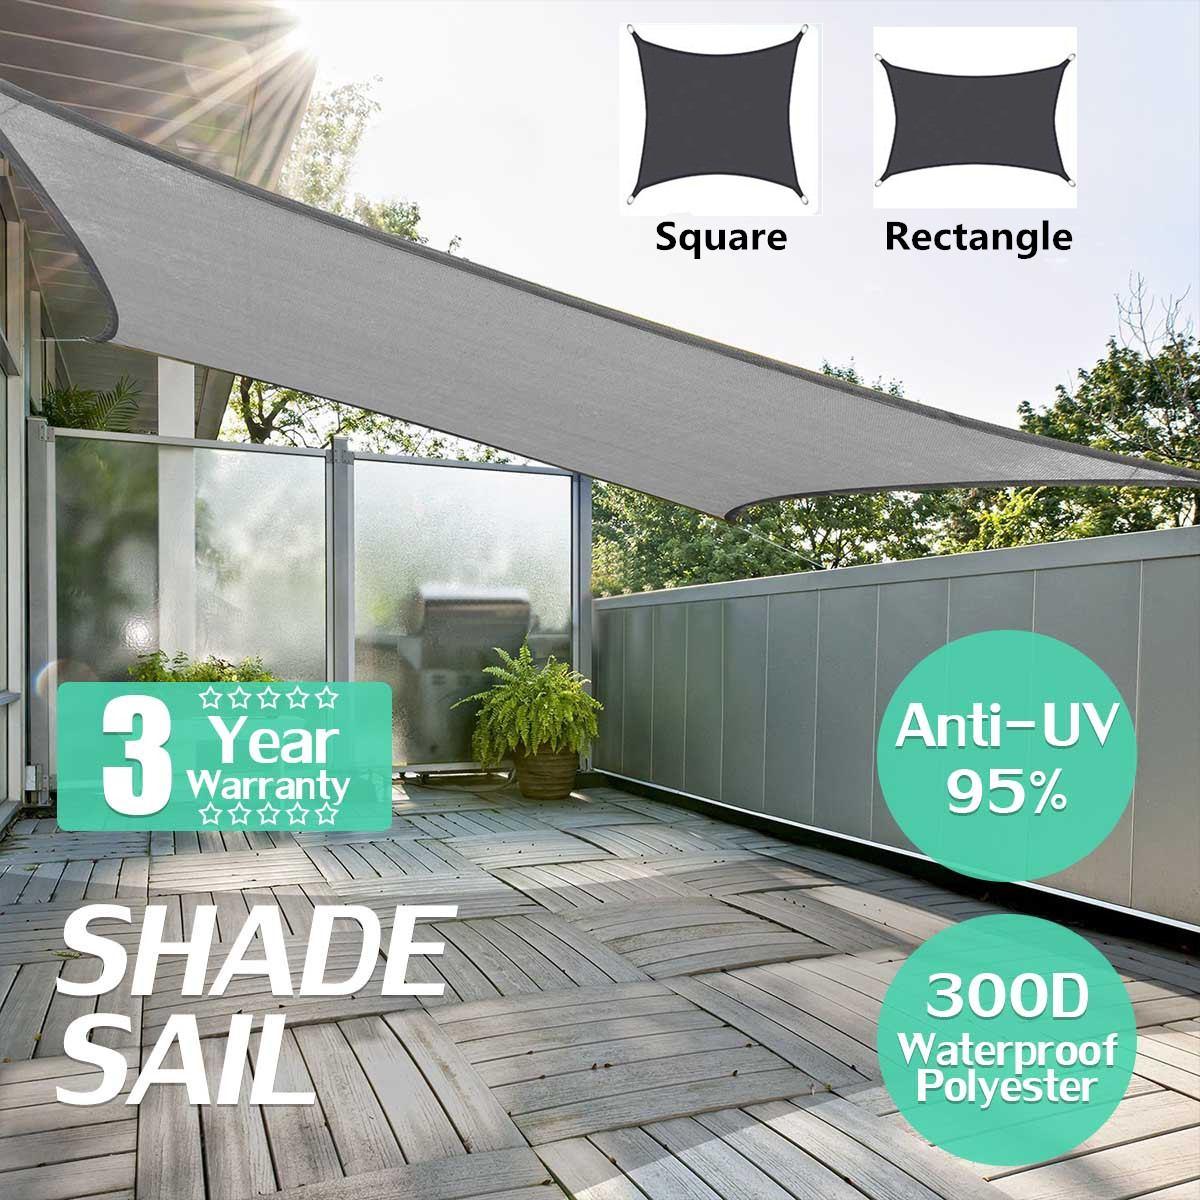 Waterproof 300D Black Square Rectangle Shade Sail Garden Terrace Canopy Swimming Sun Shade Camping Hiking Yard Sail Awnings